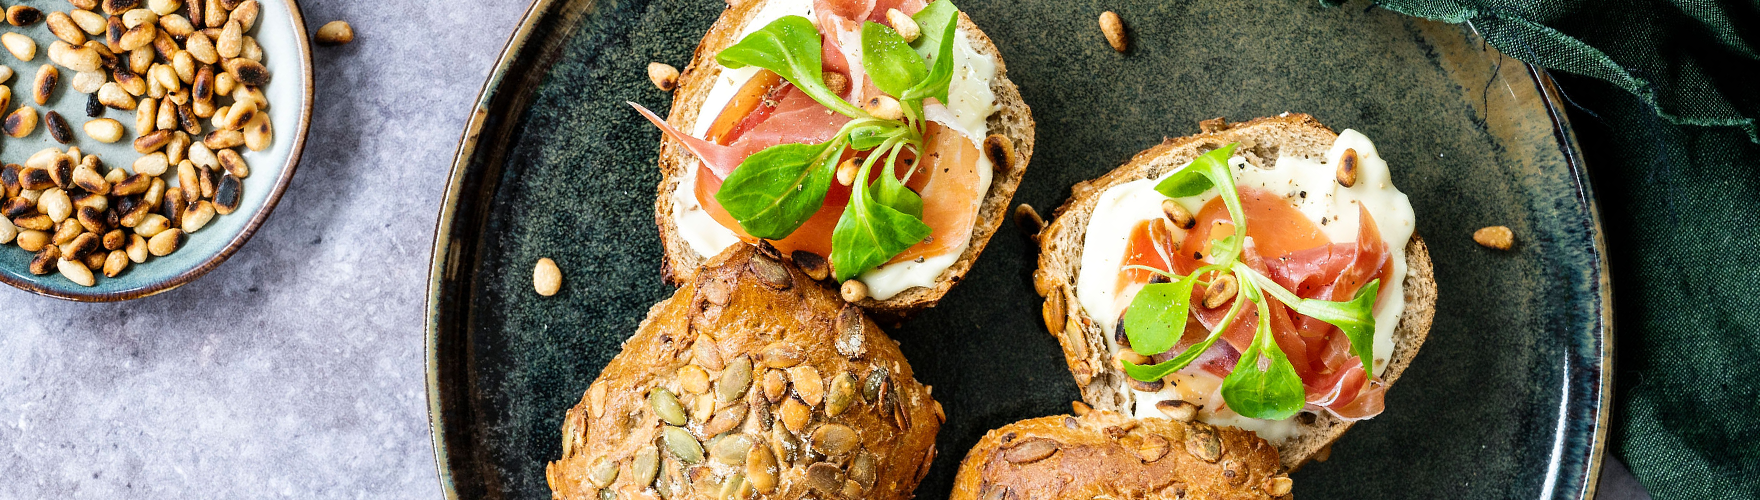 Pompoenbroodje met serranoham, veldsla en pijnboompitten